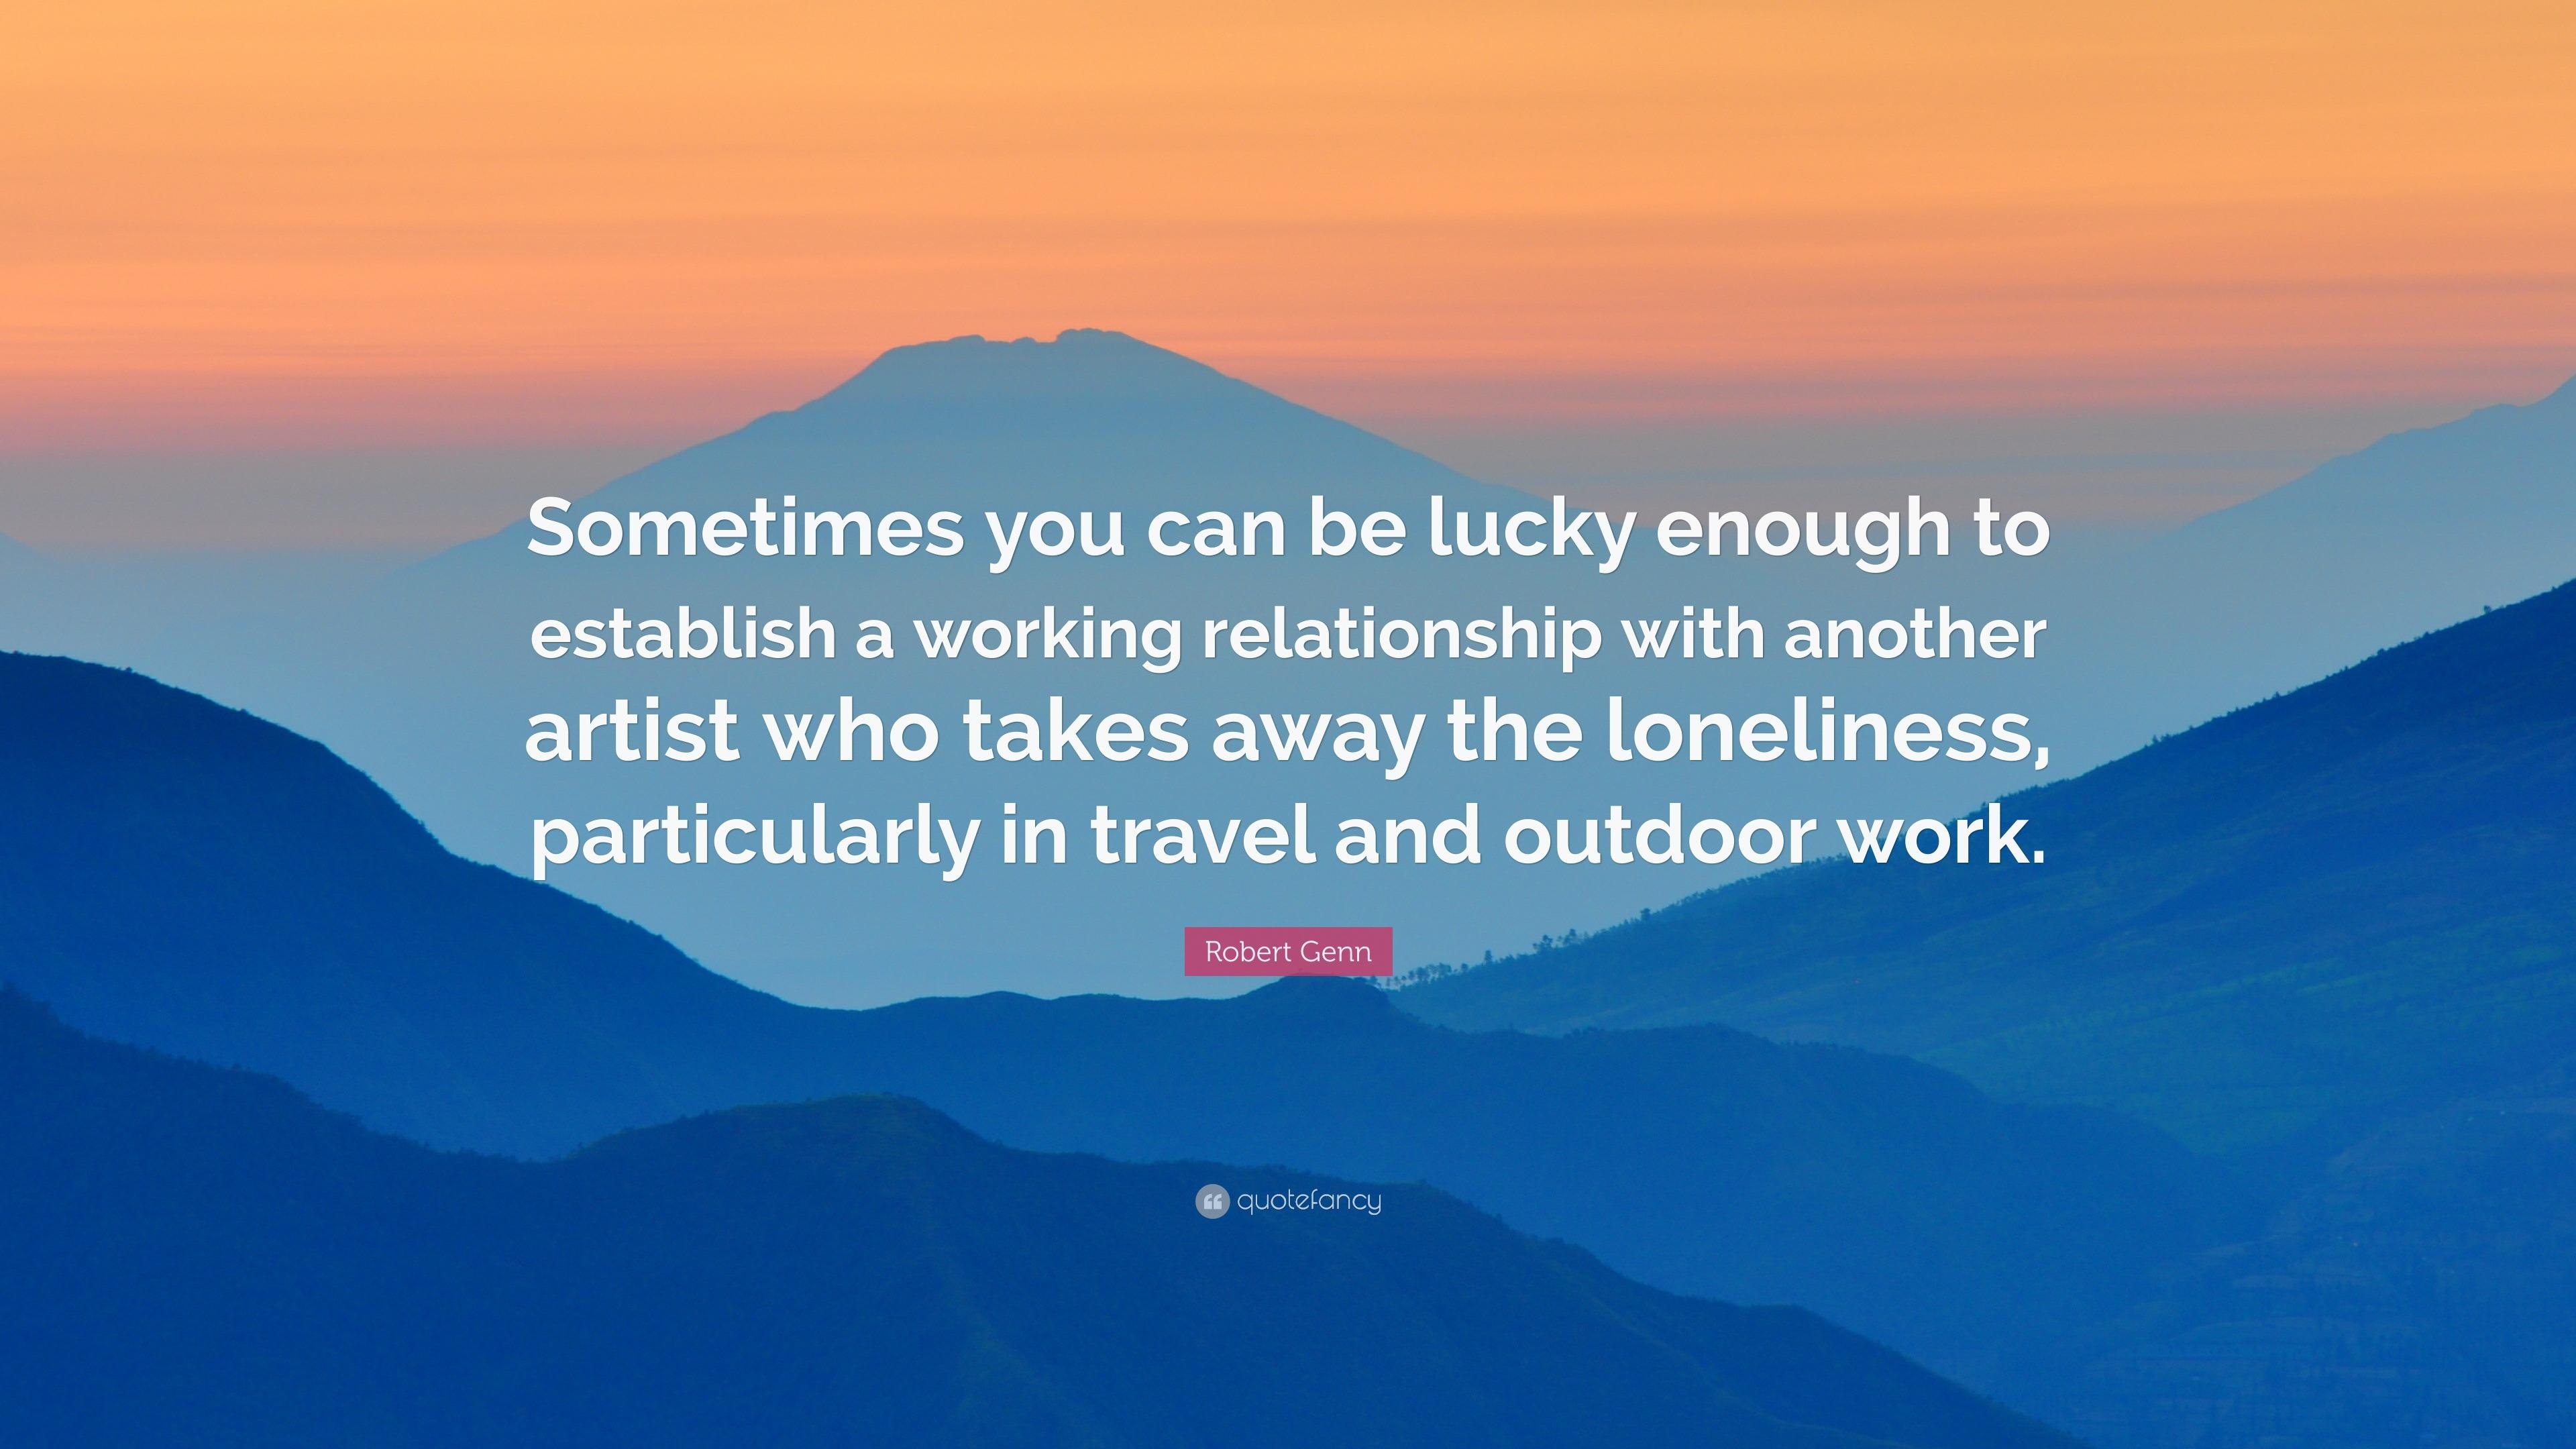 establish a working relationship